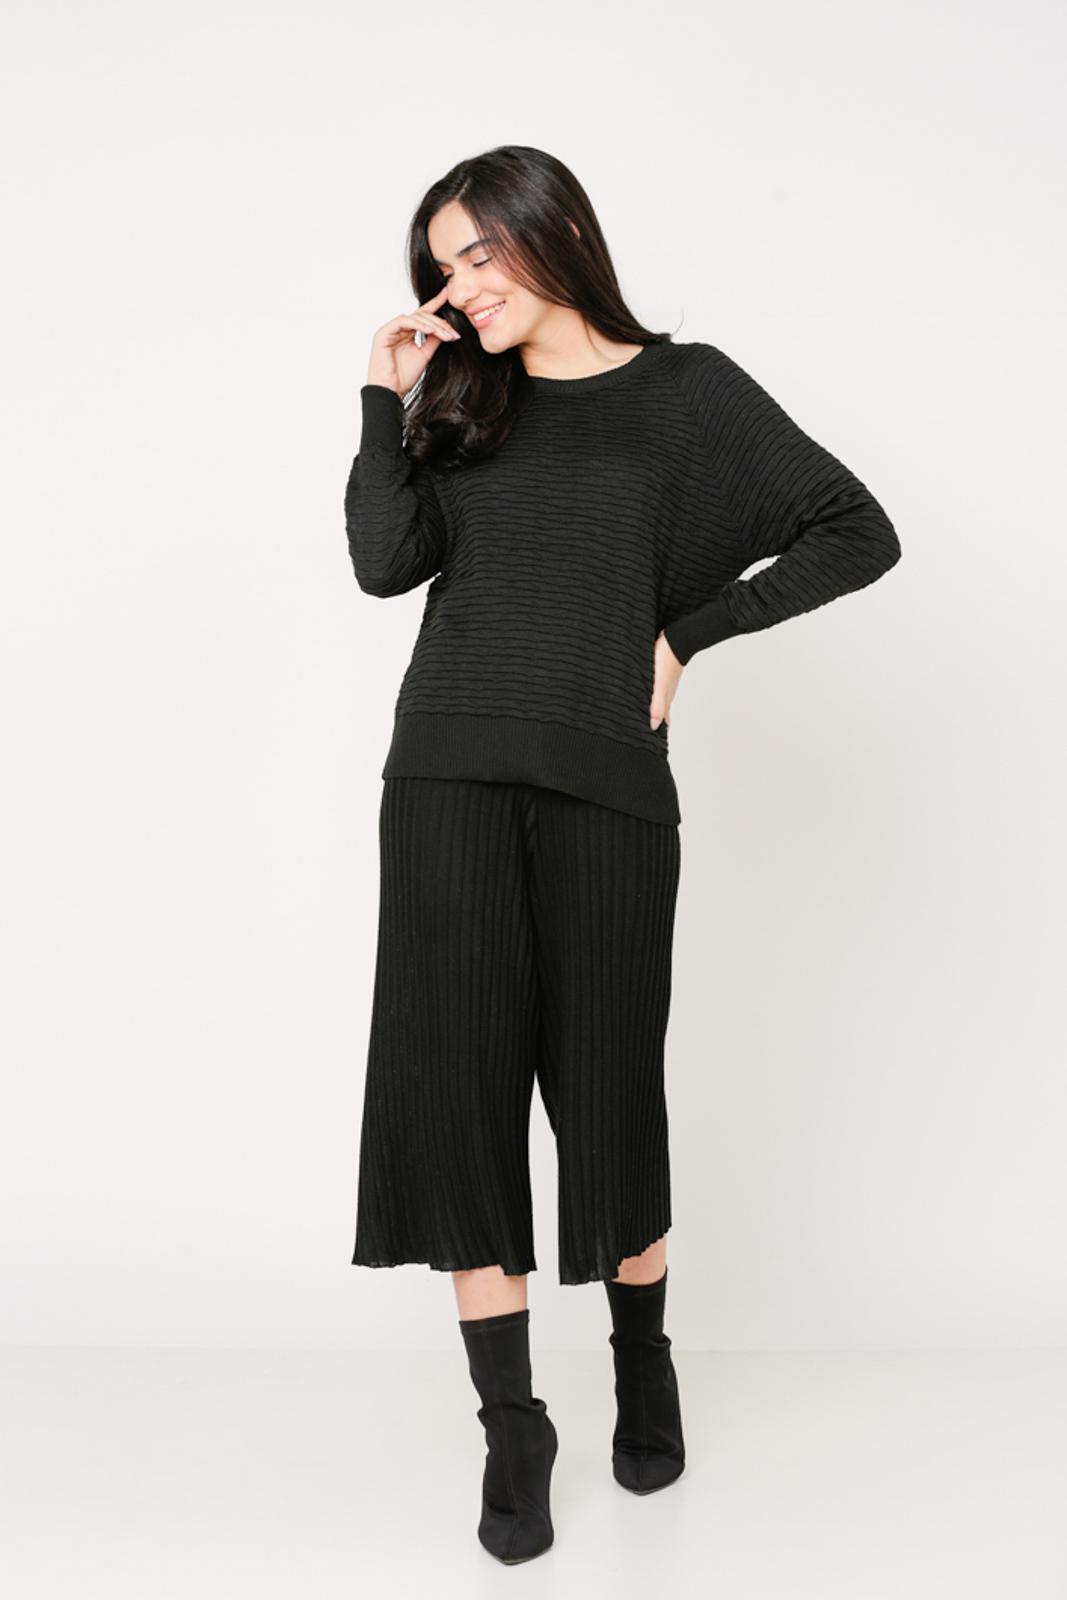 Conjunto de tricot Ralm calça pantacourt nervuras e blusa tricot nervuras - Preto